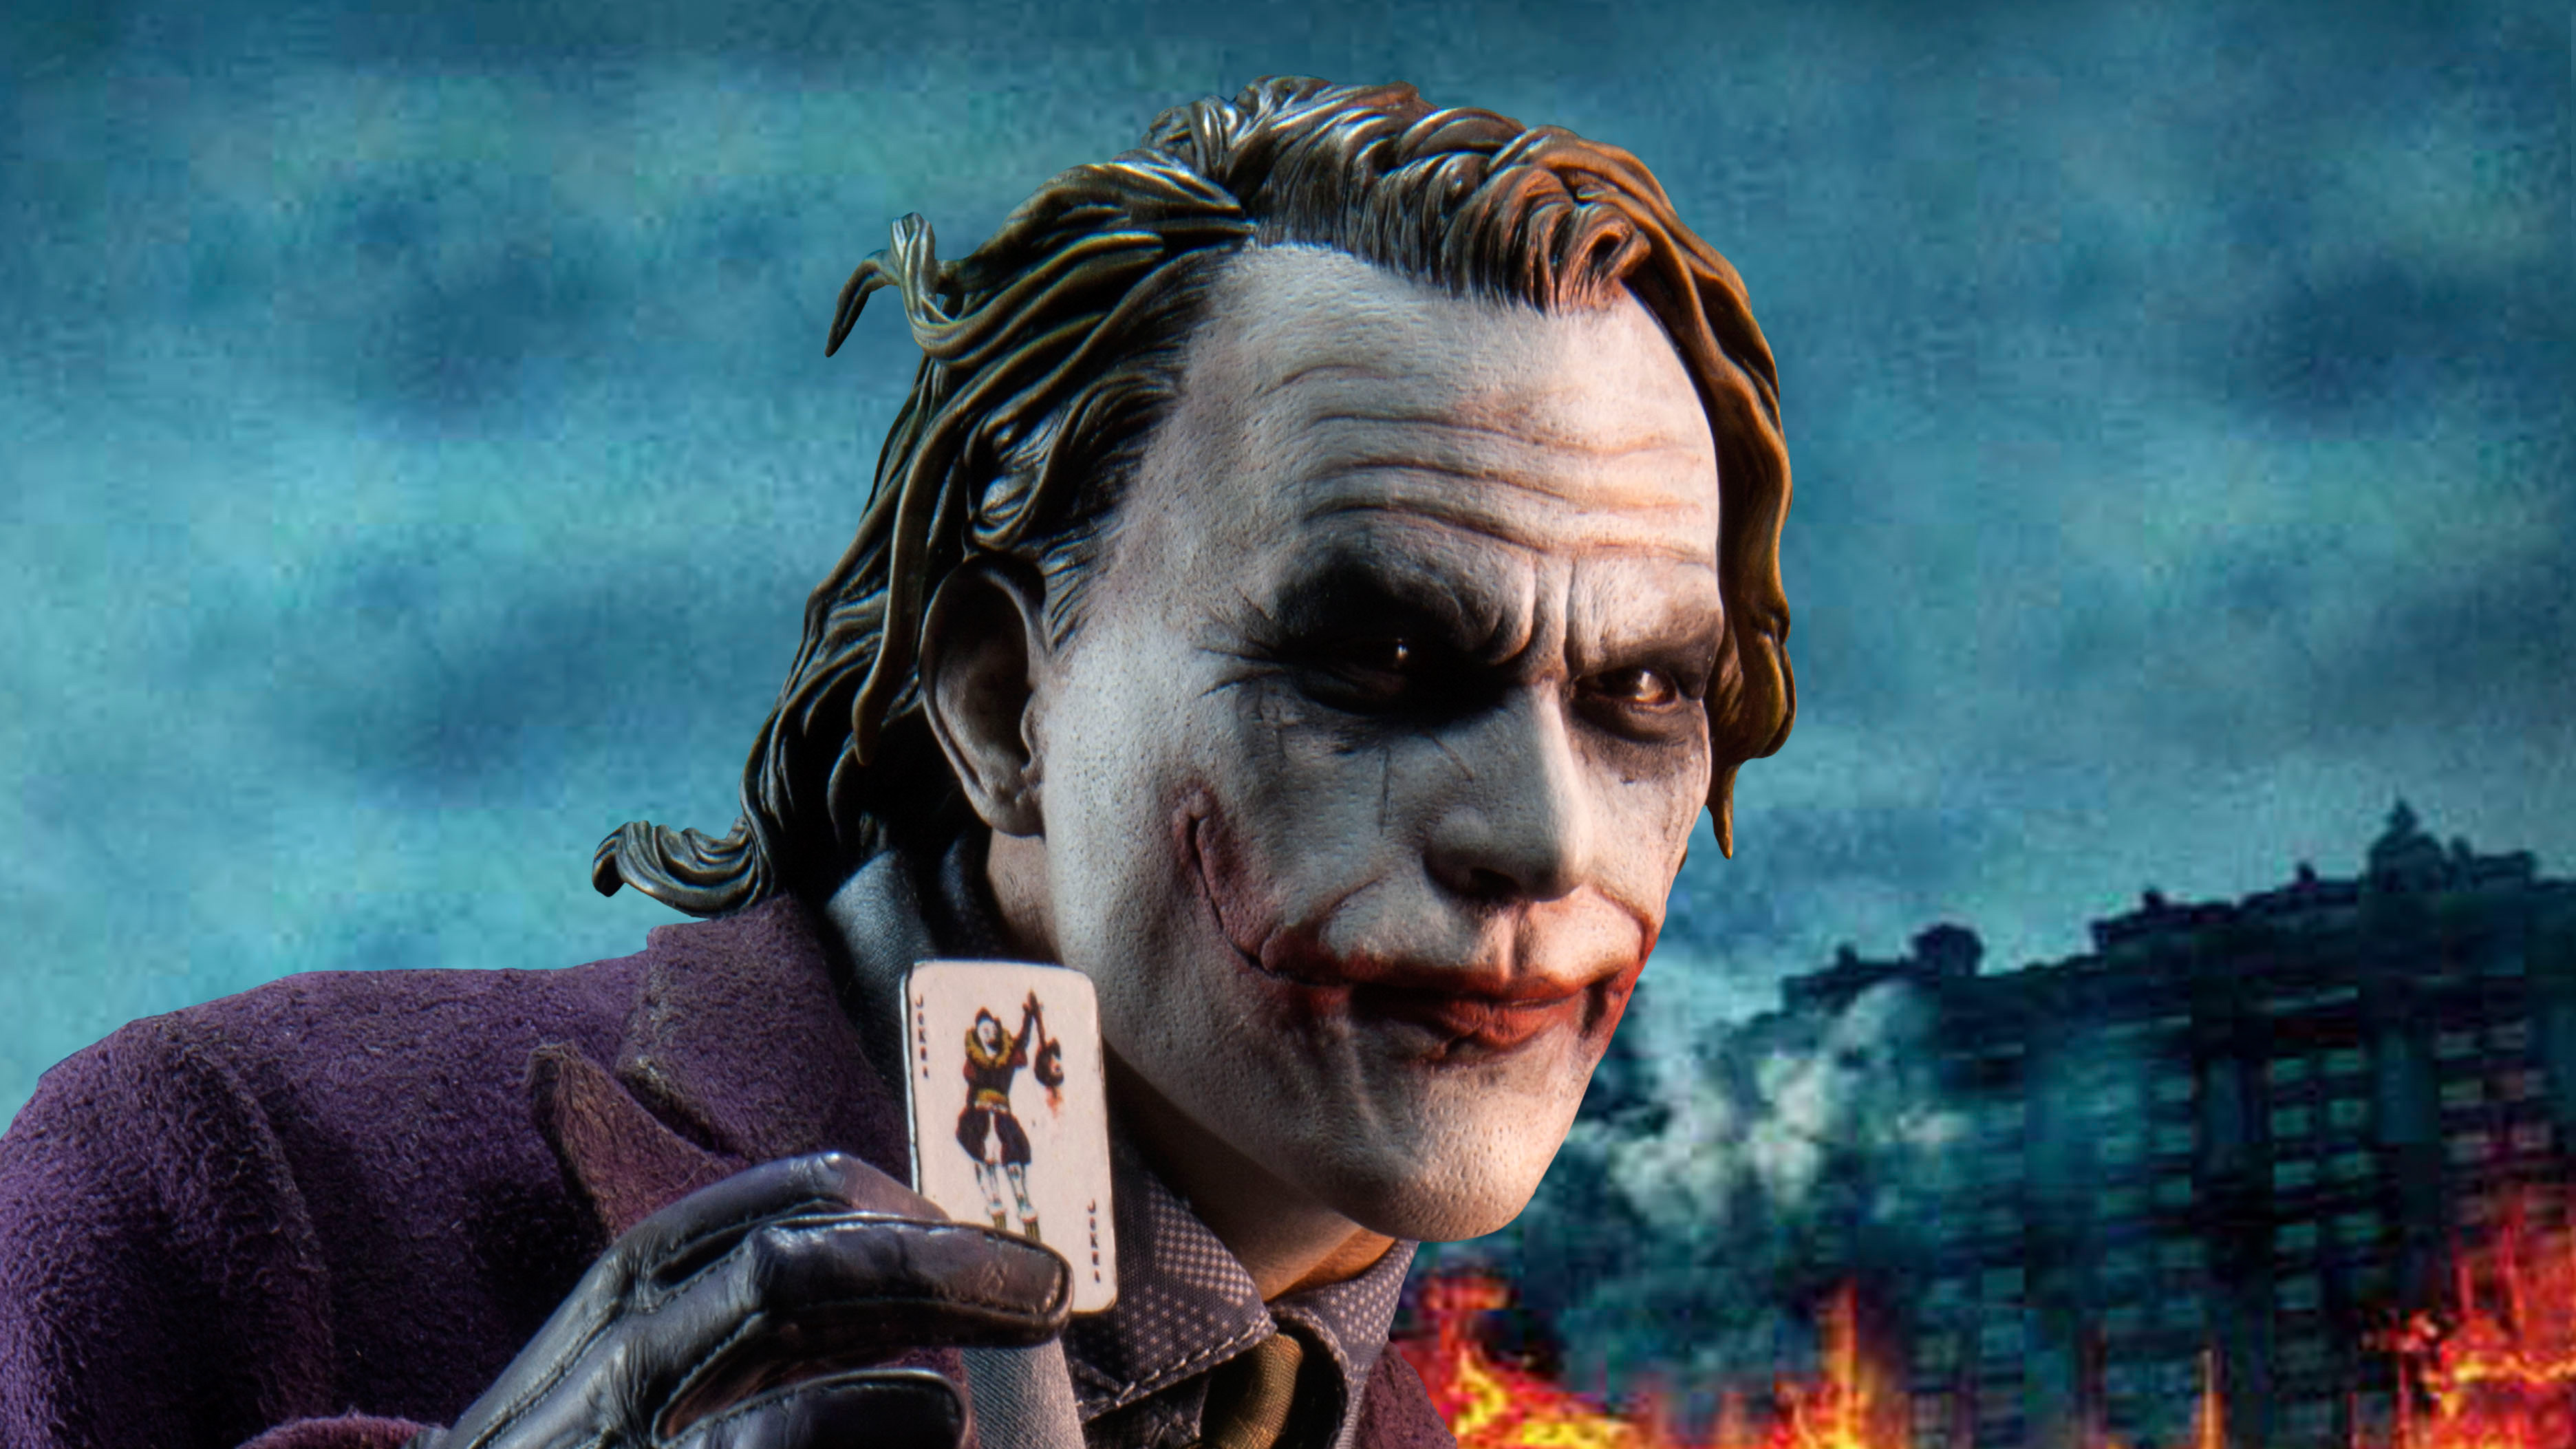 Joker Digital Art 4k, HD Superheroes, 4k Wallpapers ...